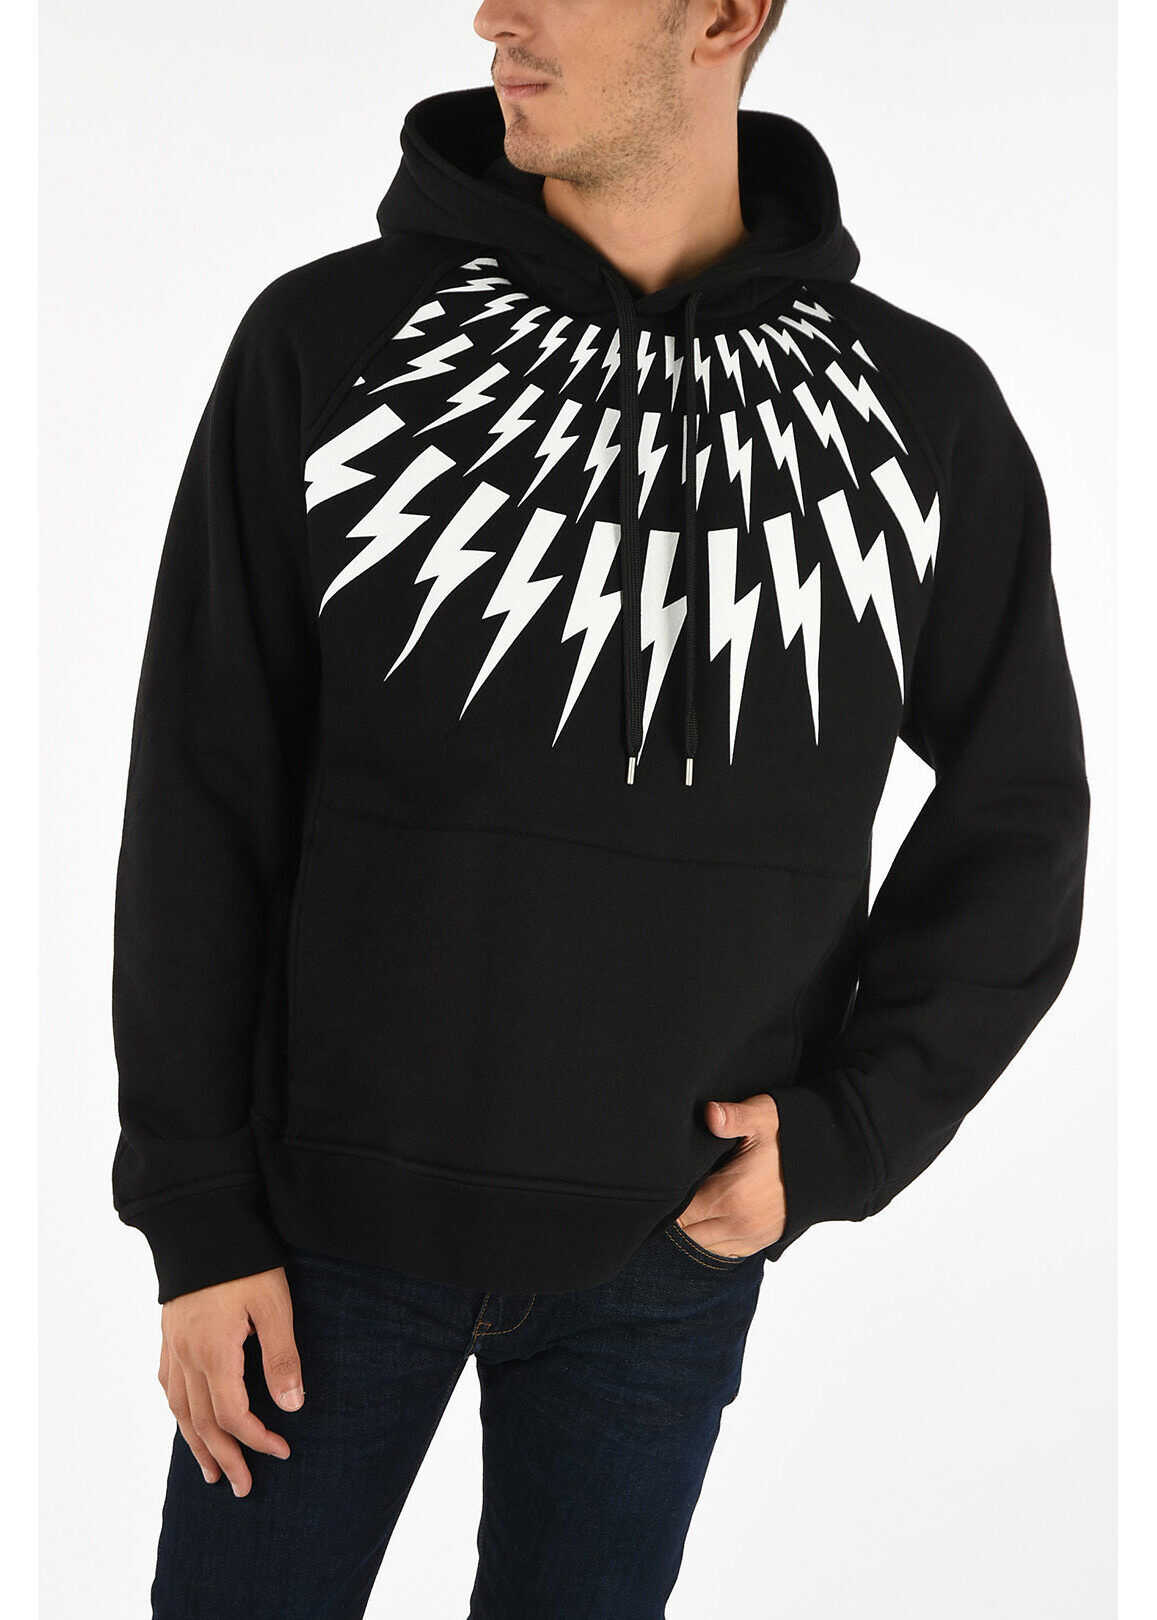 Neil Barrett Thunderbolt Print Raglan Fit Sweatshirt BLACK imagine